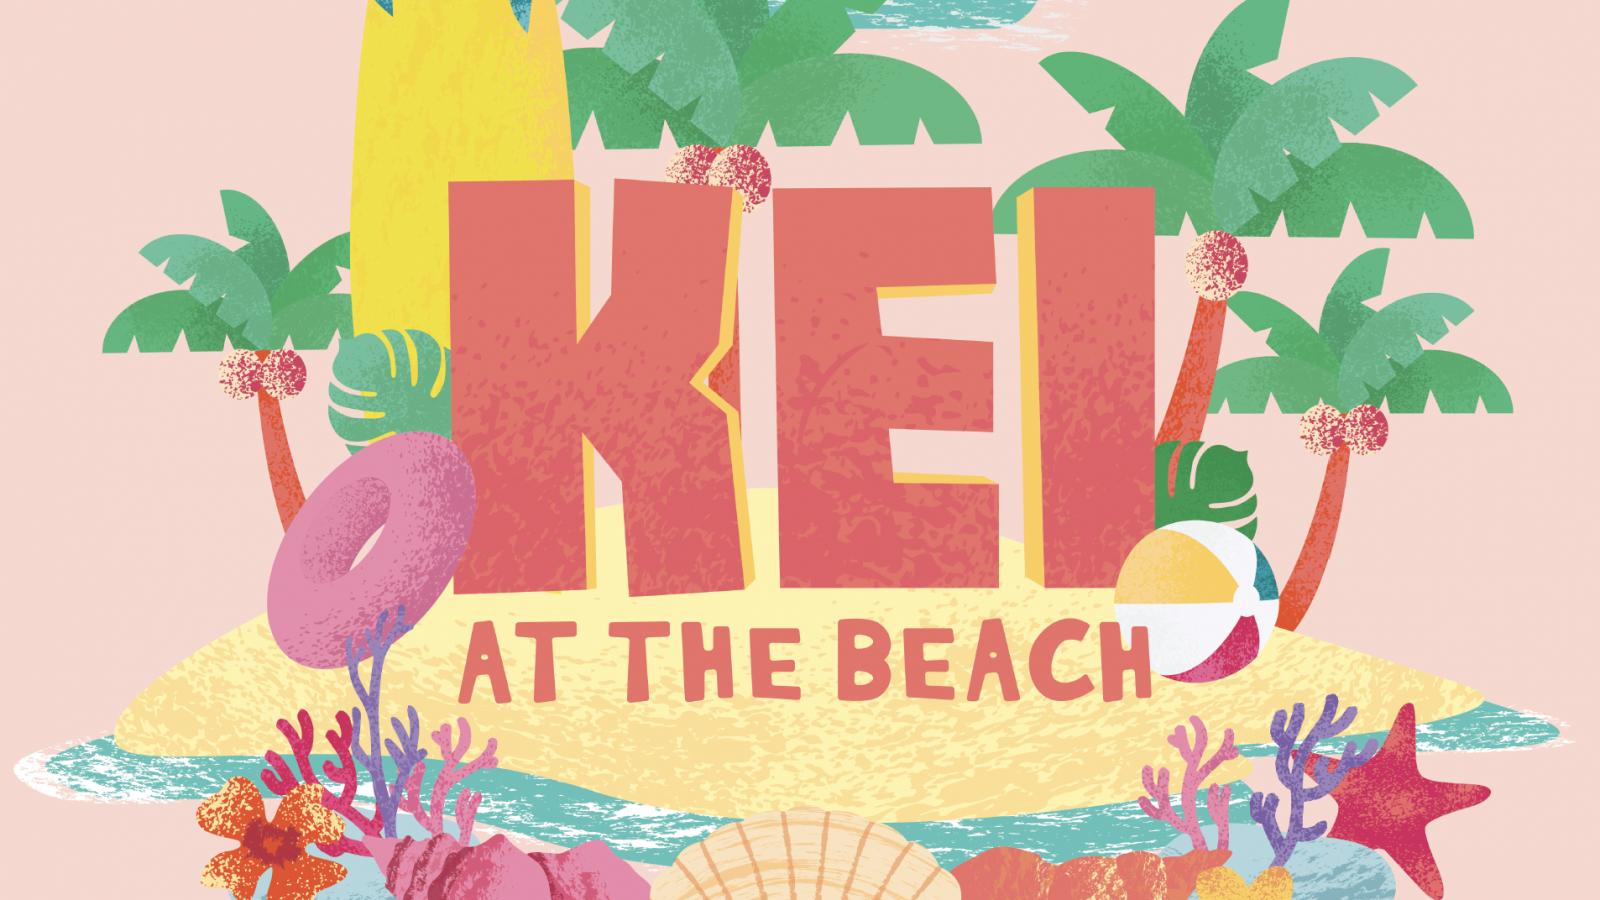 Lustrumfestival: KEI at the Beach!